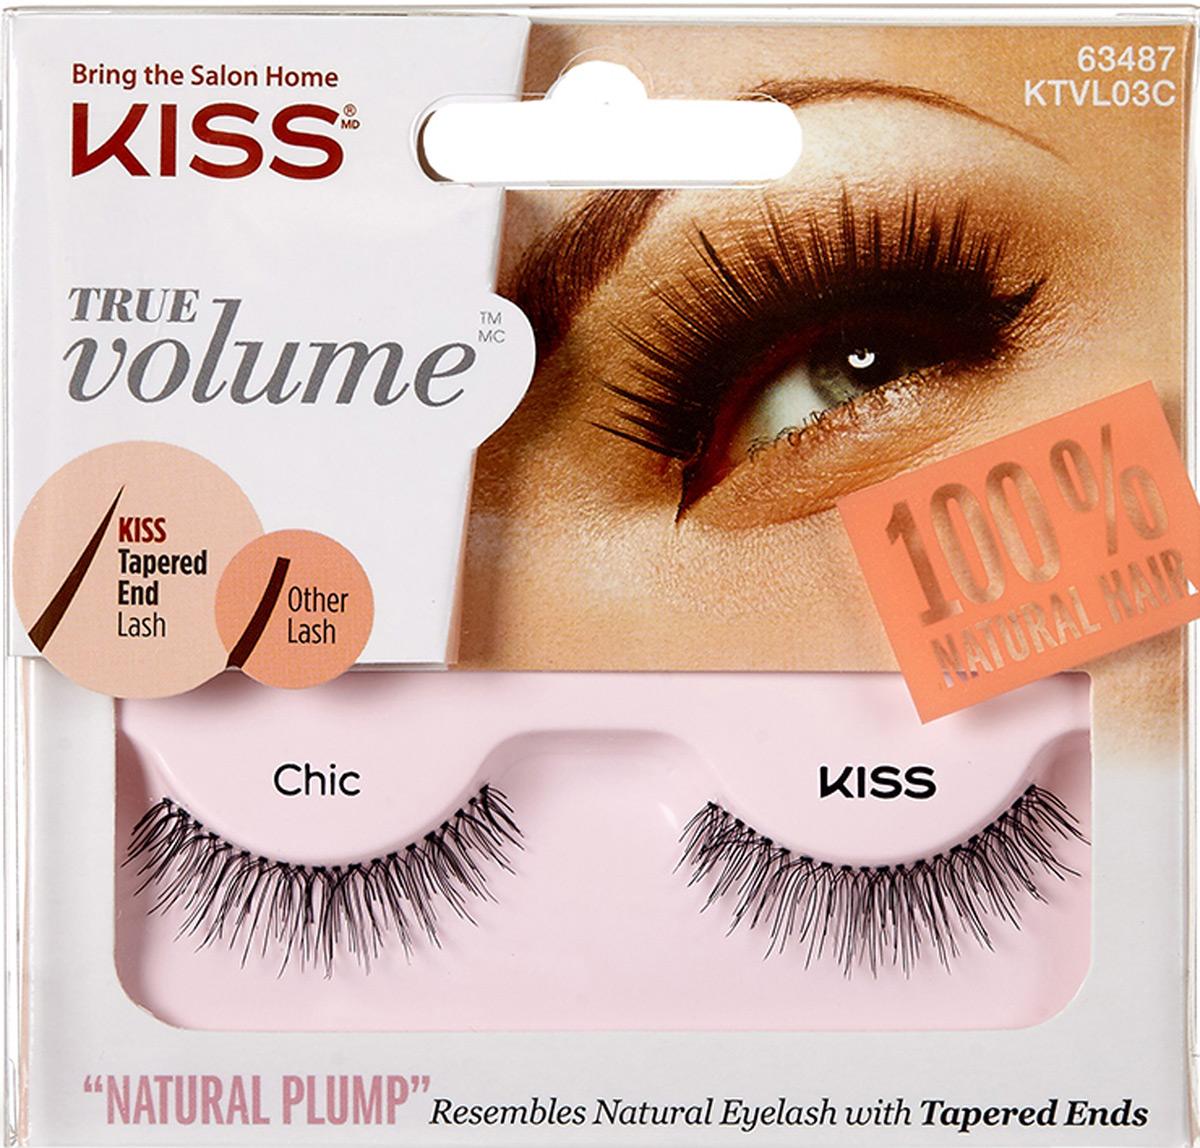 Kiss True Volume Накладные ресницы Lash Chic KTVL03C накладные ресницы kiss ienvy eyelashes juicy volume 02